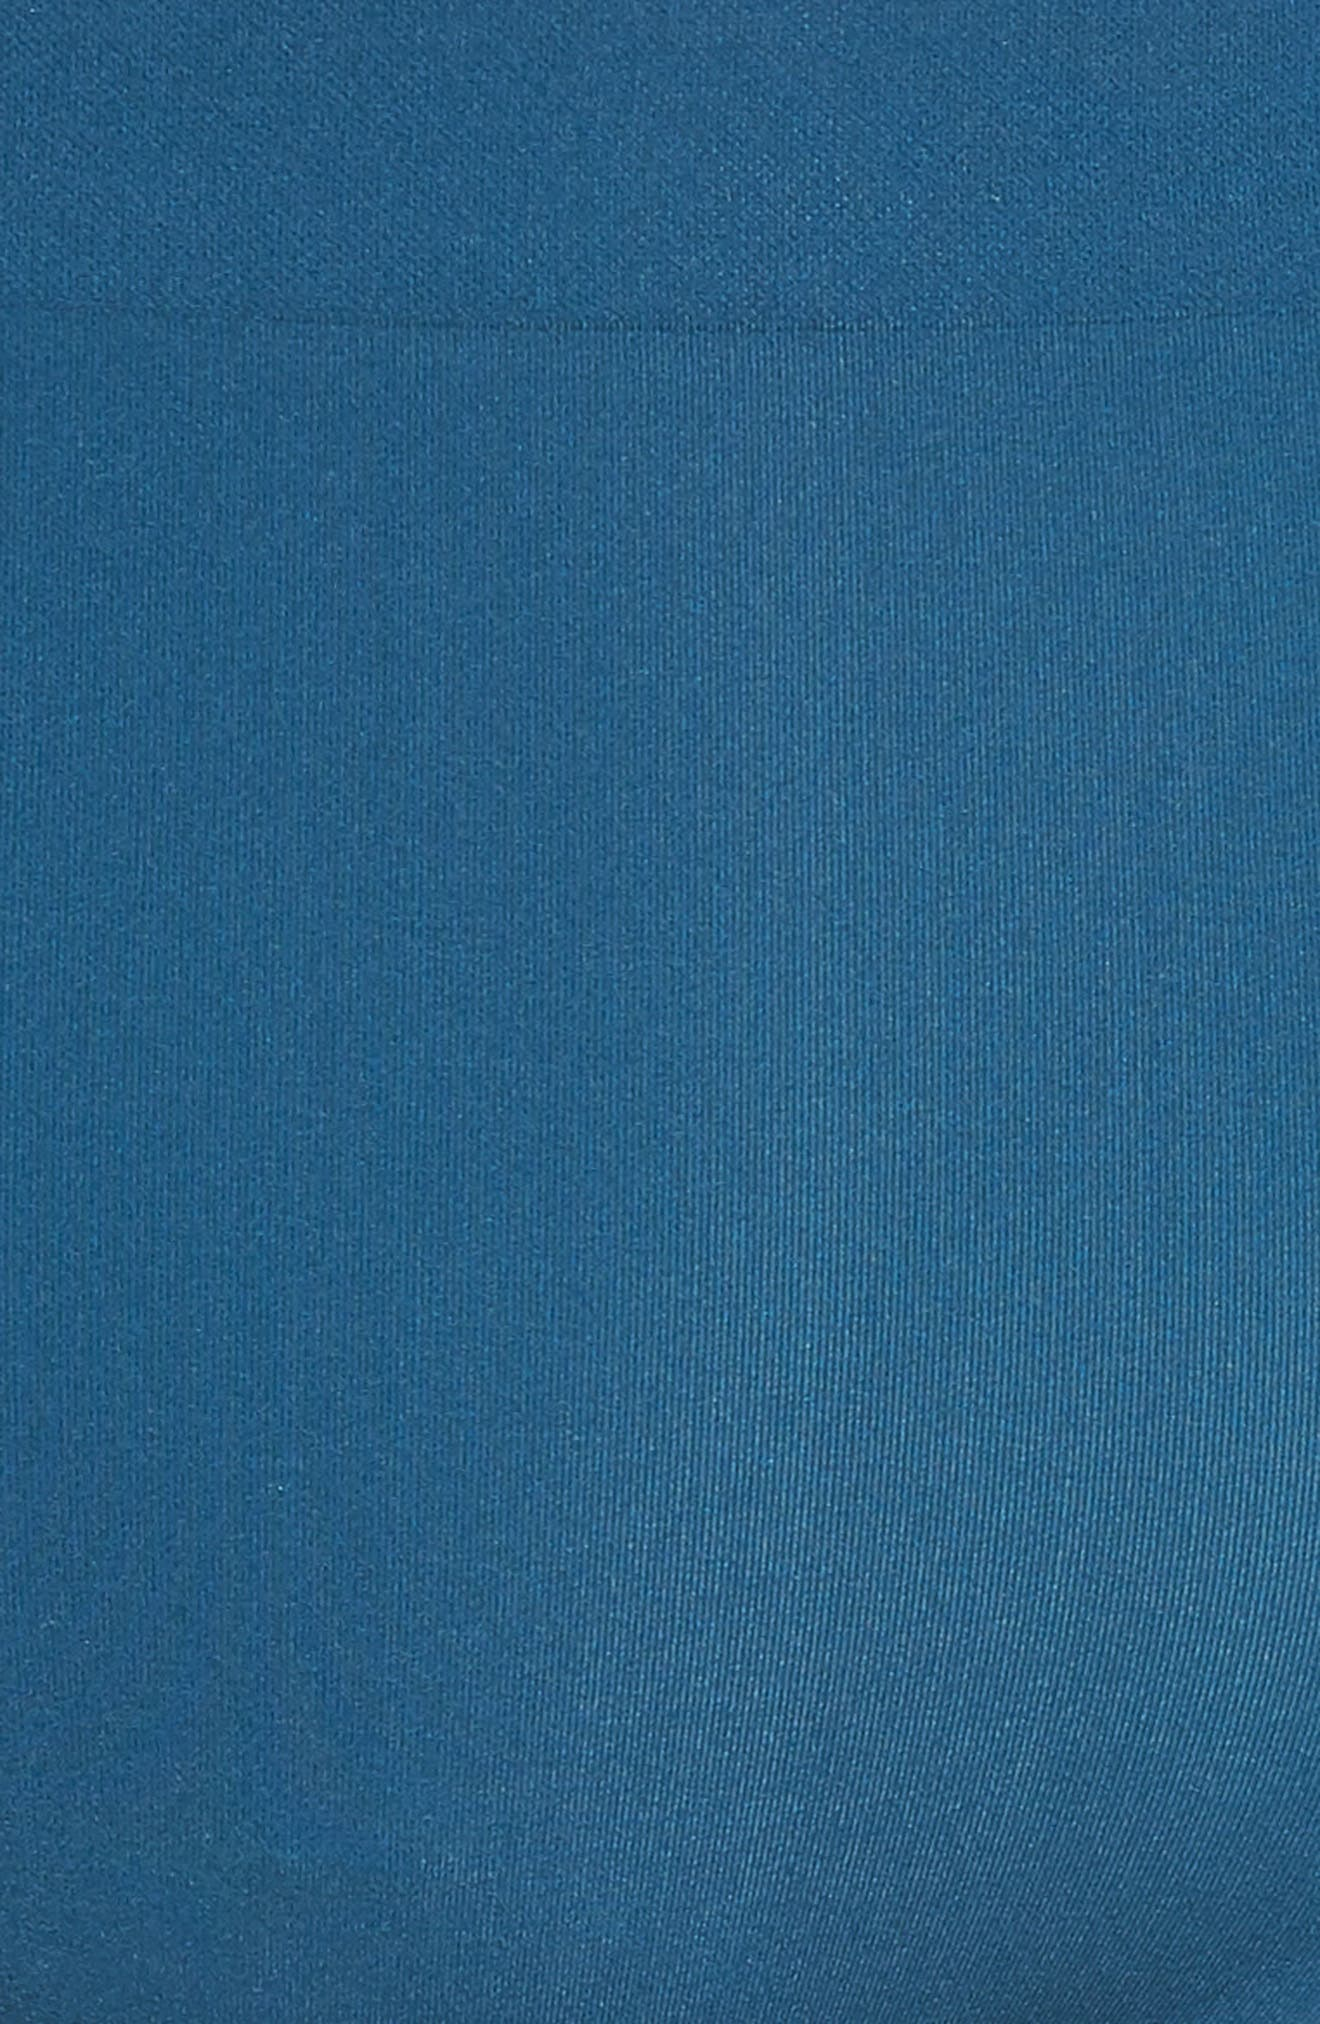 'Skinsense' Seamless Briefs,                             Alternate thumbnail 5, color,                             MAJOLICA BLUE